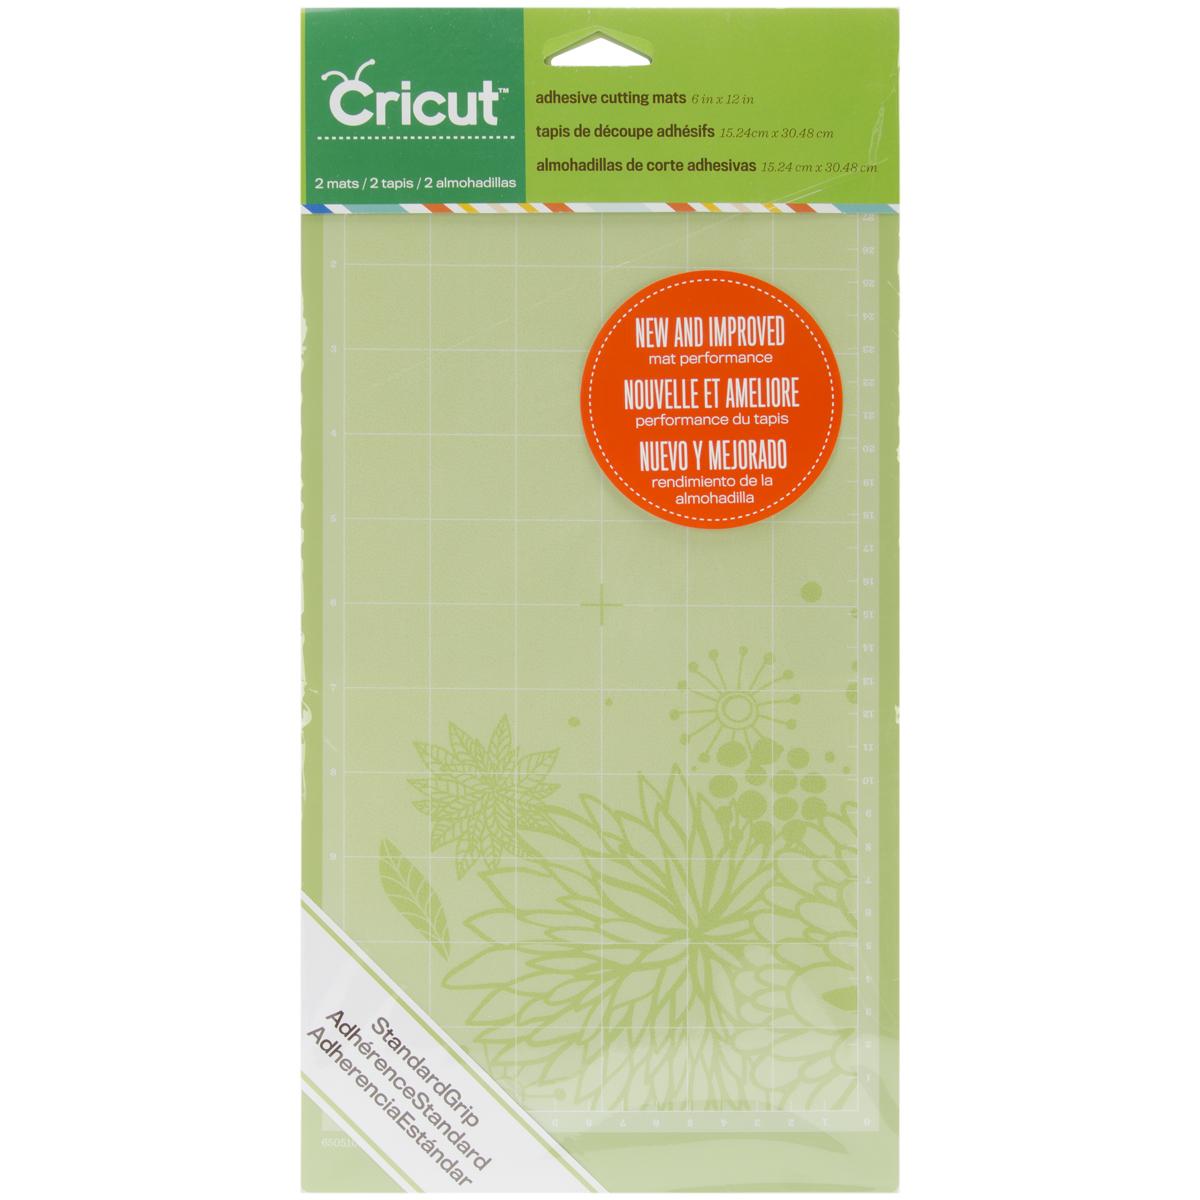 Cricut 12-by-24-Inch Adhesive Cutting Mat